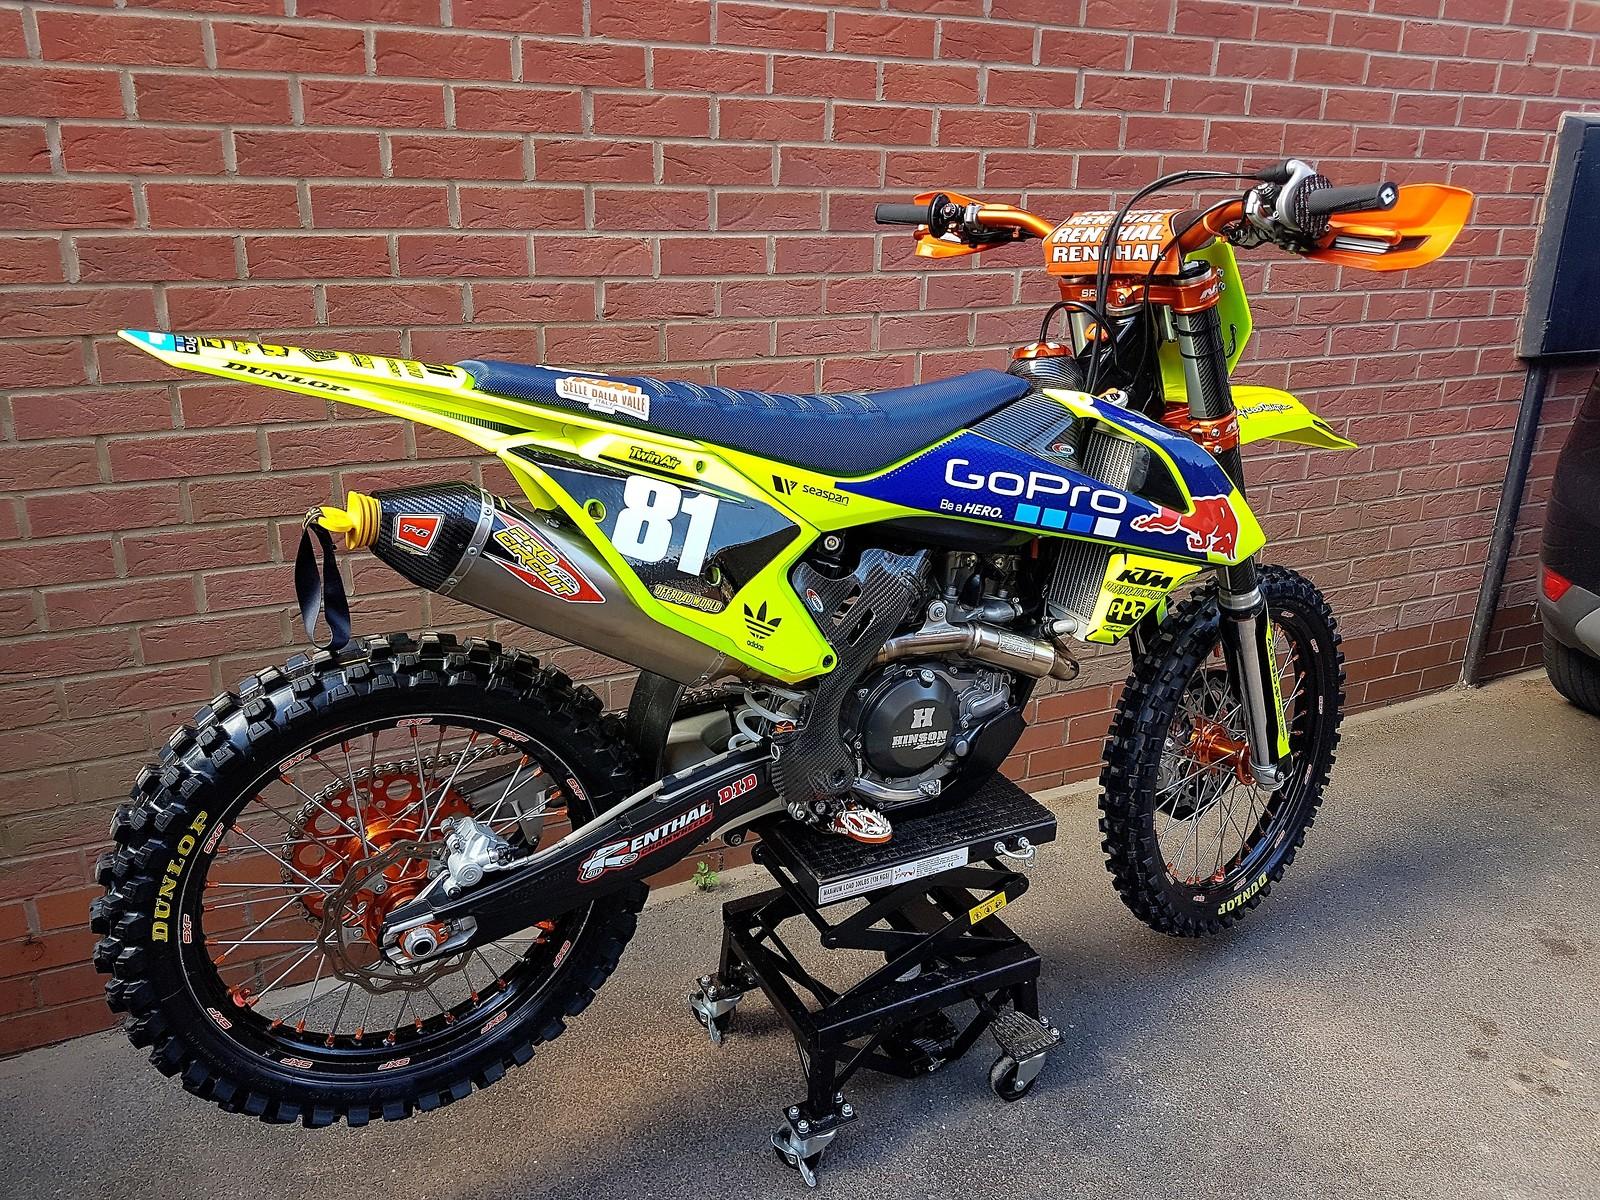 Fluorescent yellow 2016 SXF 450 - locky - Motocross Pictures - Vital MX